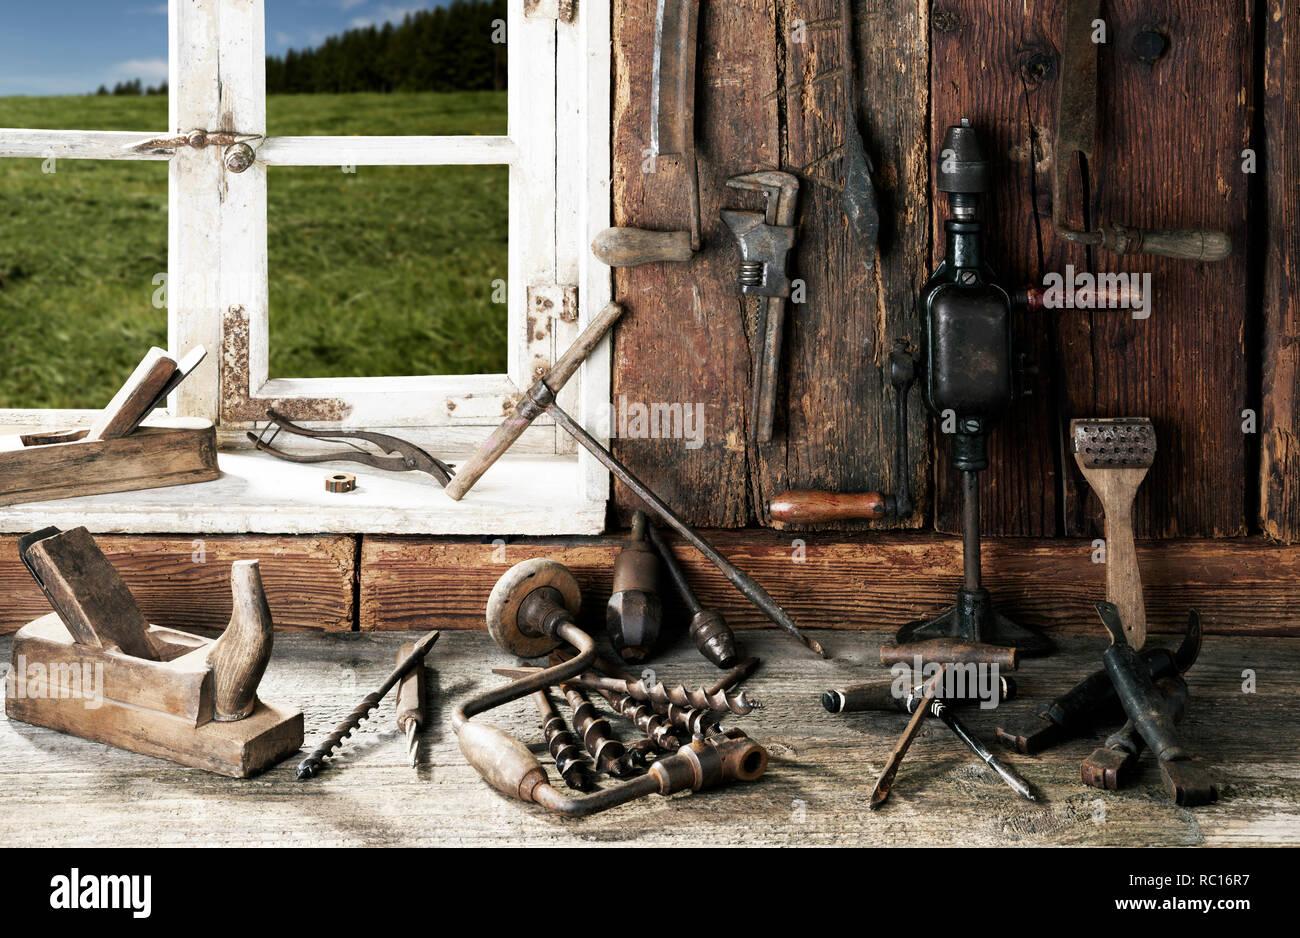 Vintage stylized old wood workshop interior - Stock Image